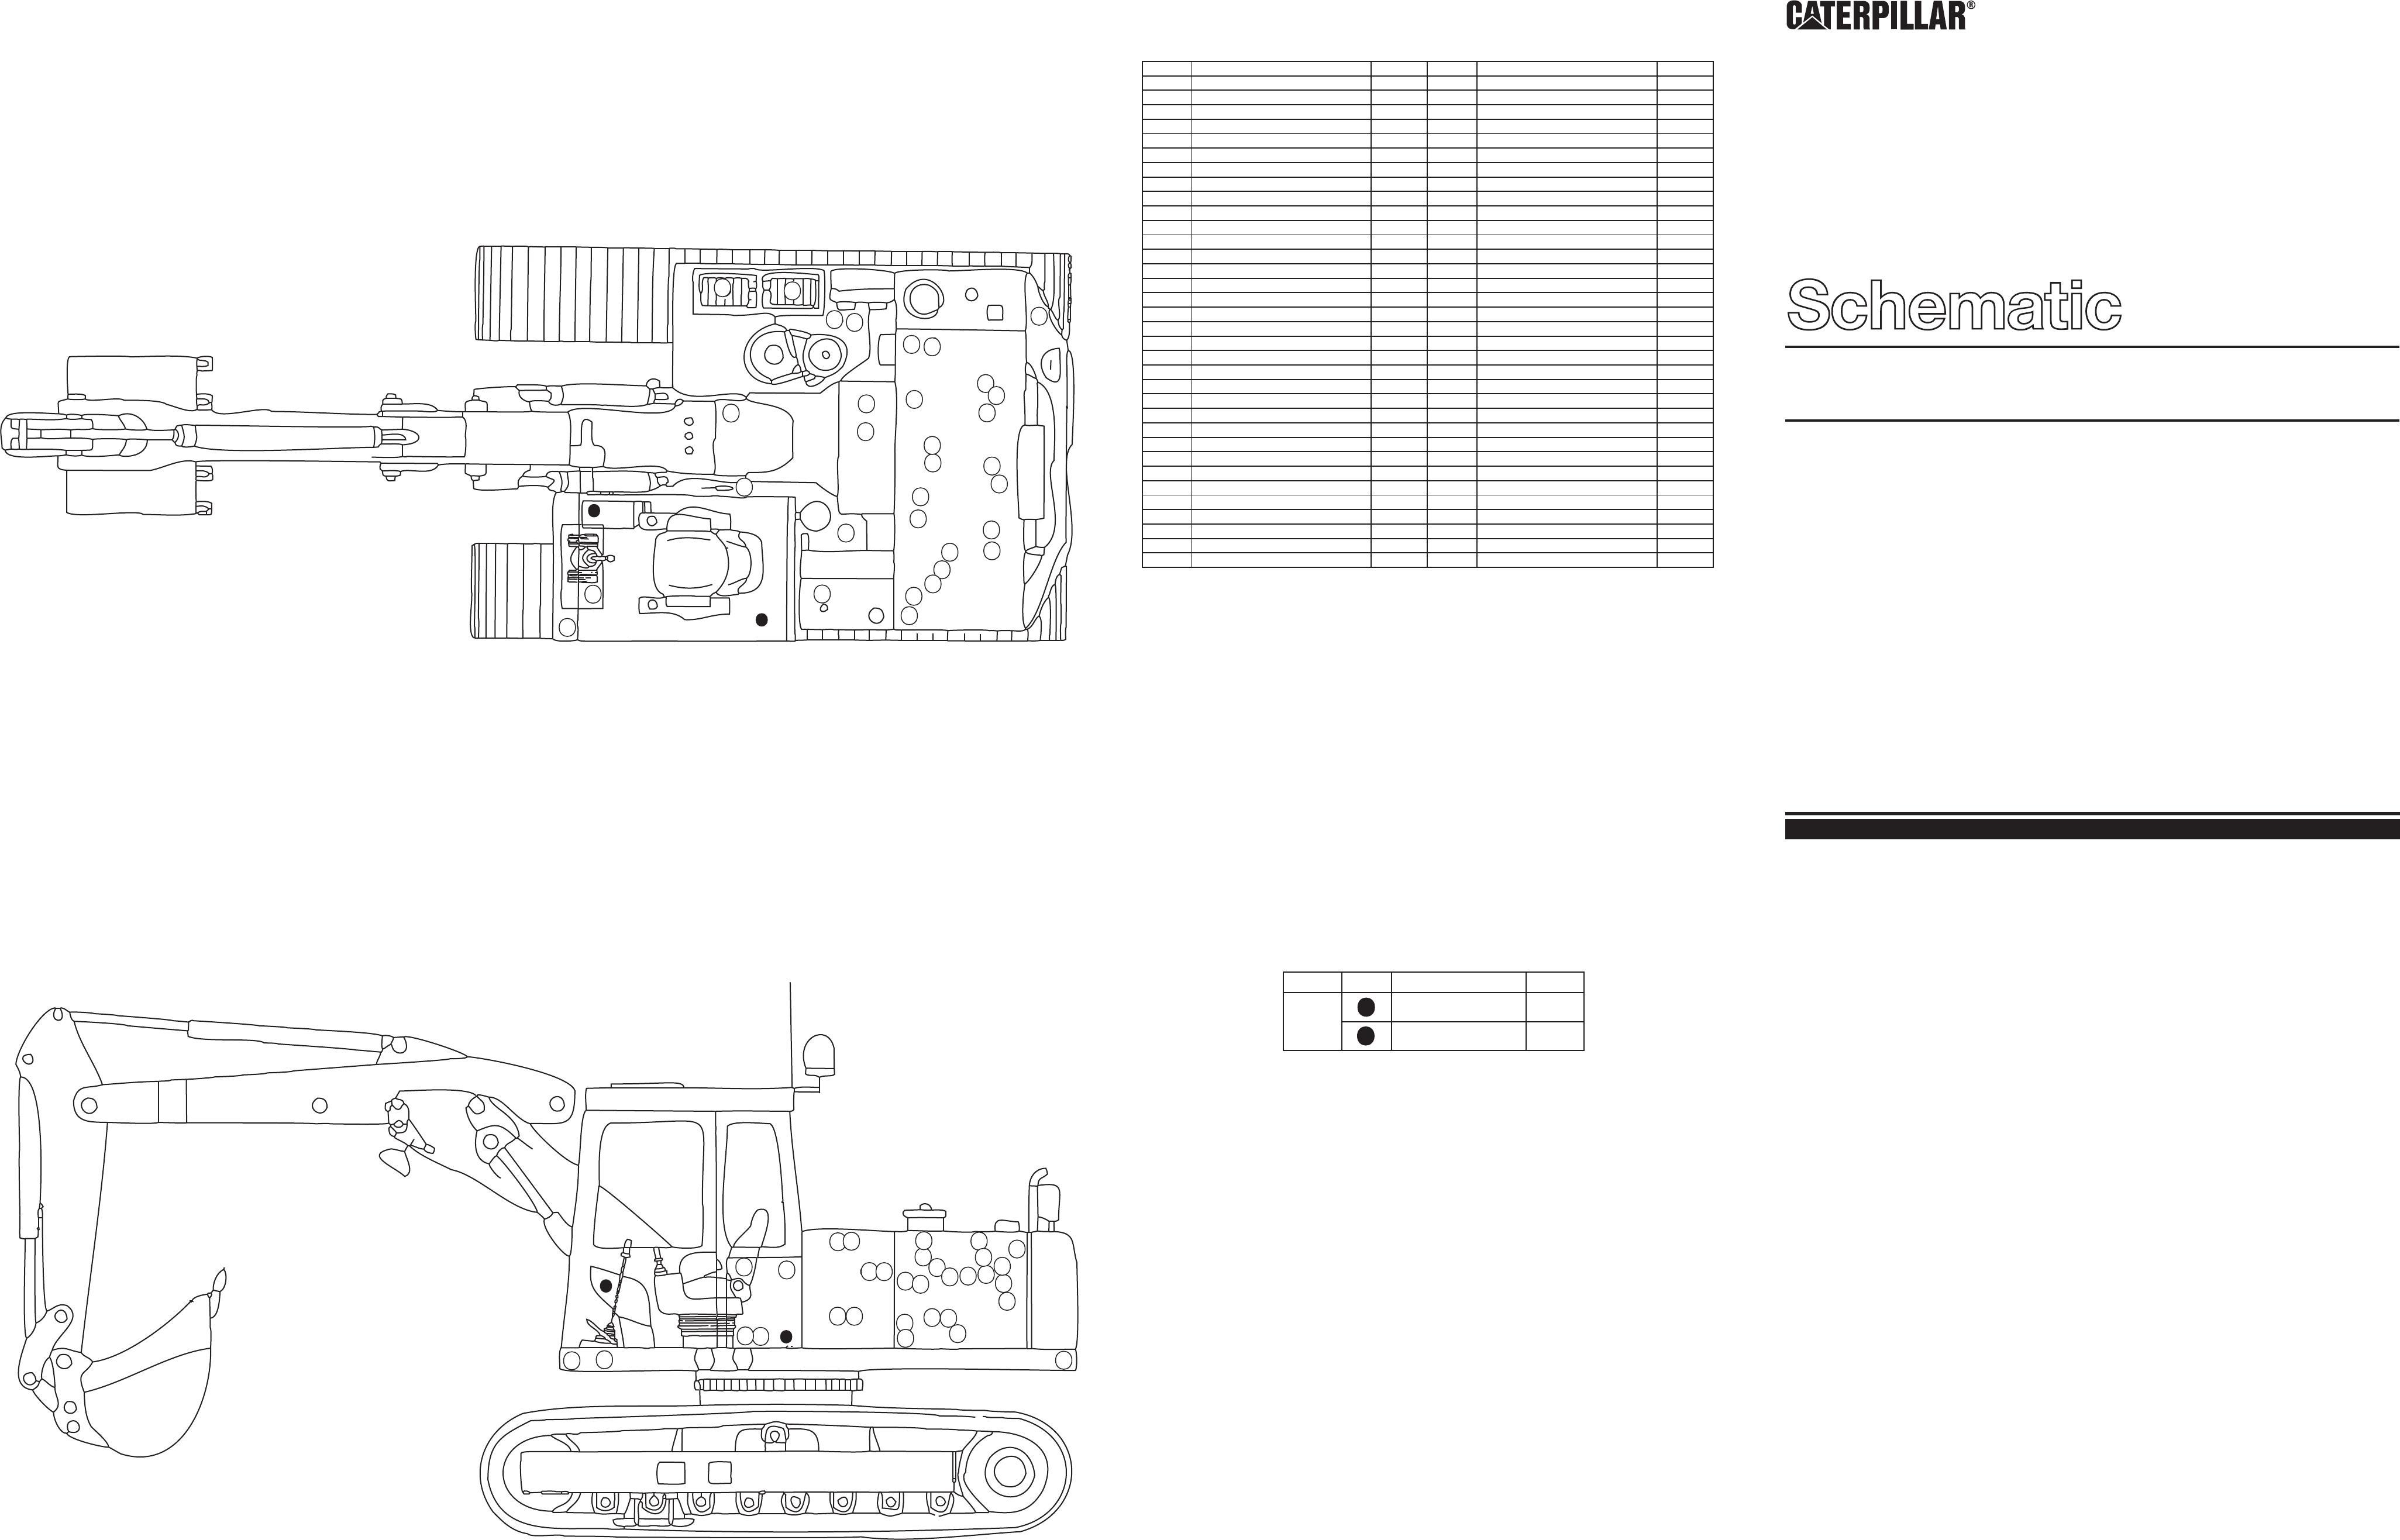 205/211 EXCAVATORS ELECTRIC SCHEMATIC USED IN SERVICE MANUAL SENR3168 | CAT  Machines Electrical Schematic